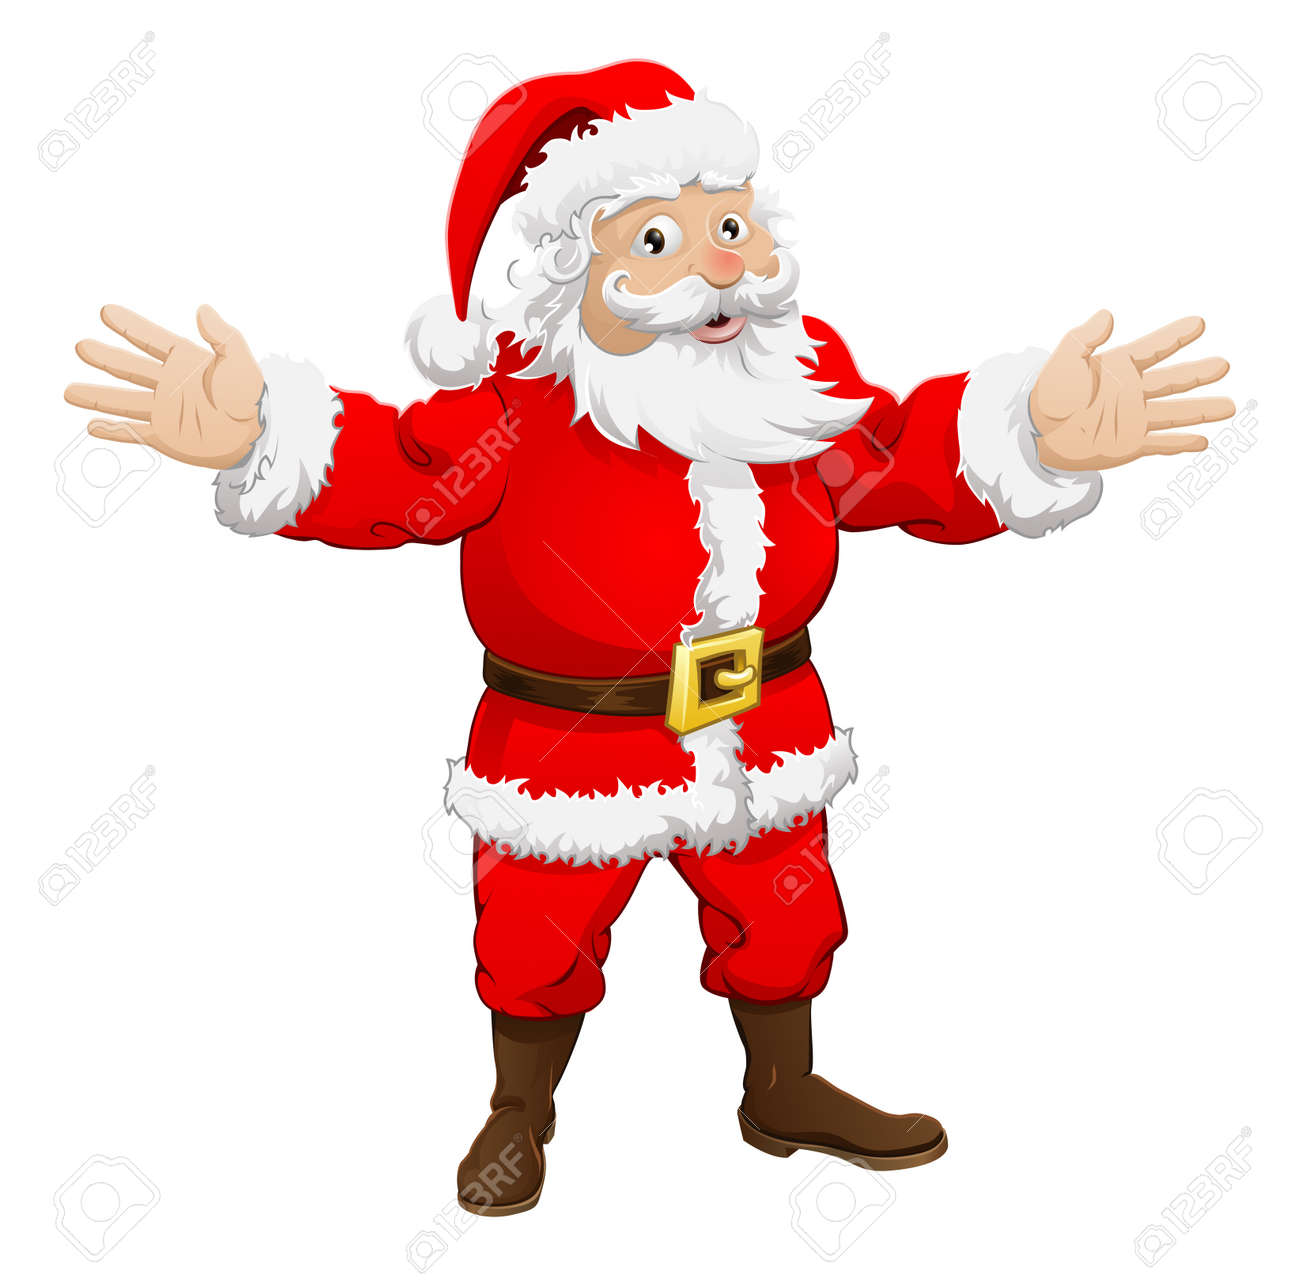 An Illustration Of A Happy Christmas Santa Claus